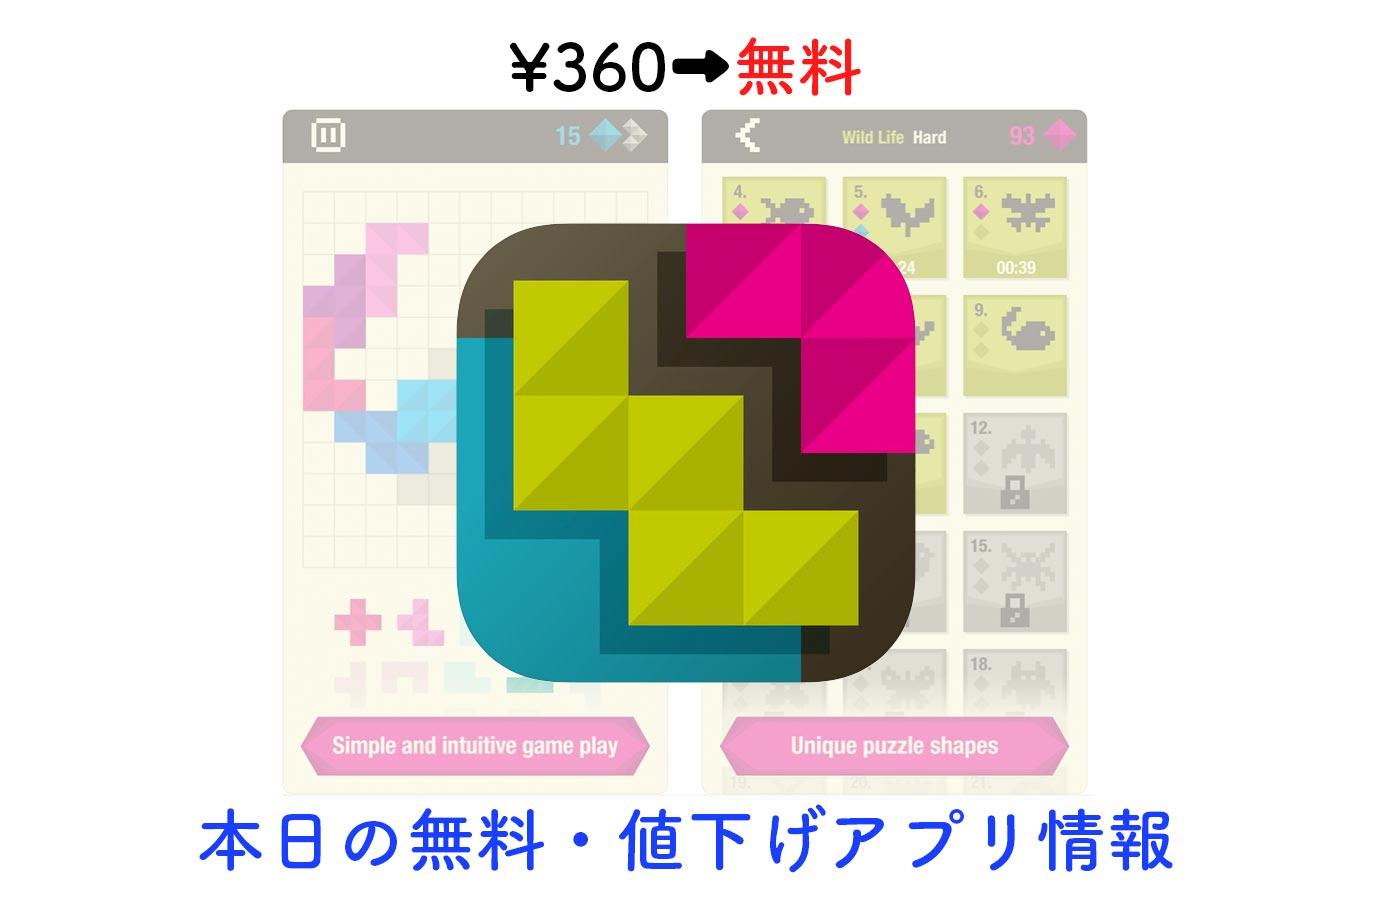 Appsale0603